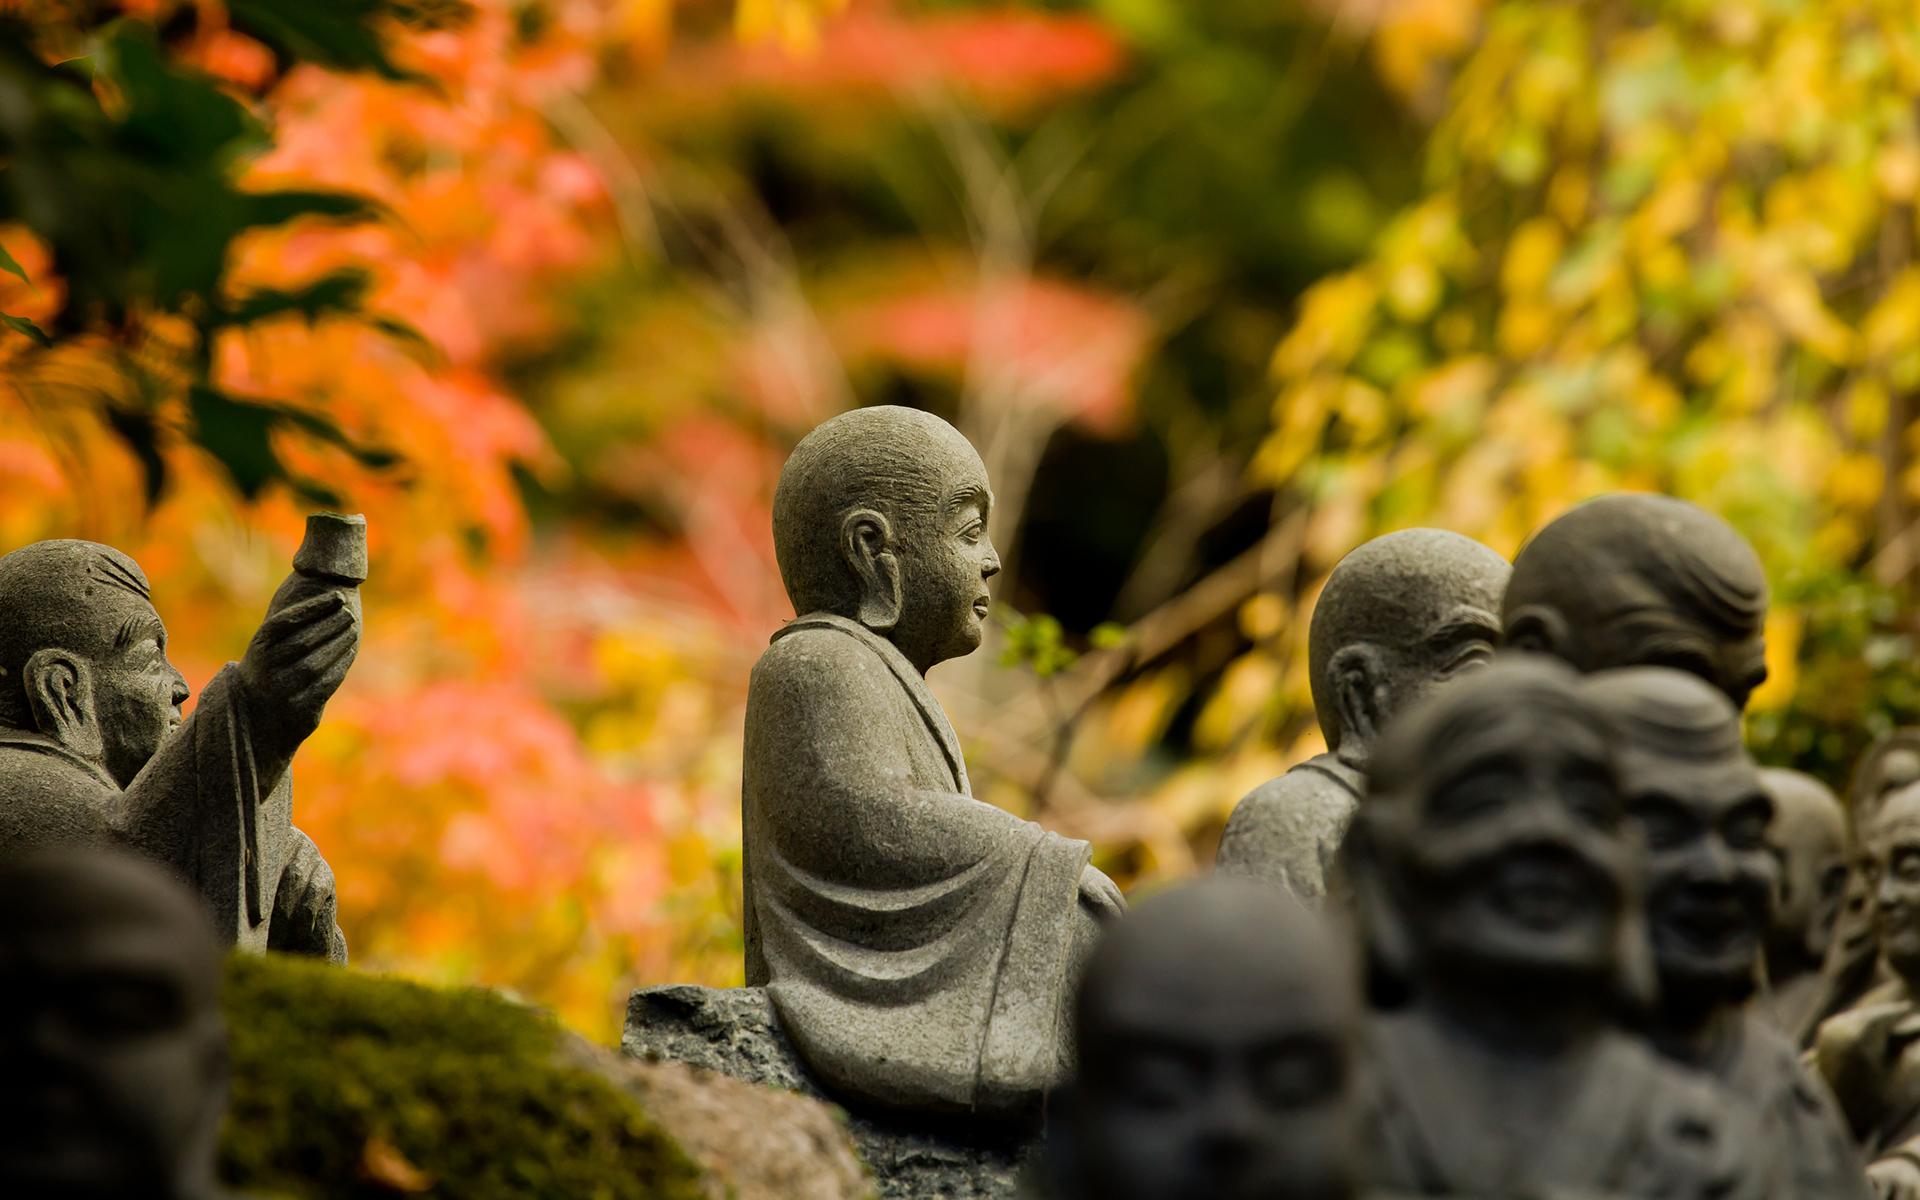 zen-garden-buddha-wallpaper-wonderfull.jpg